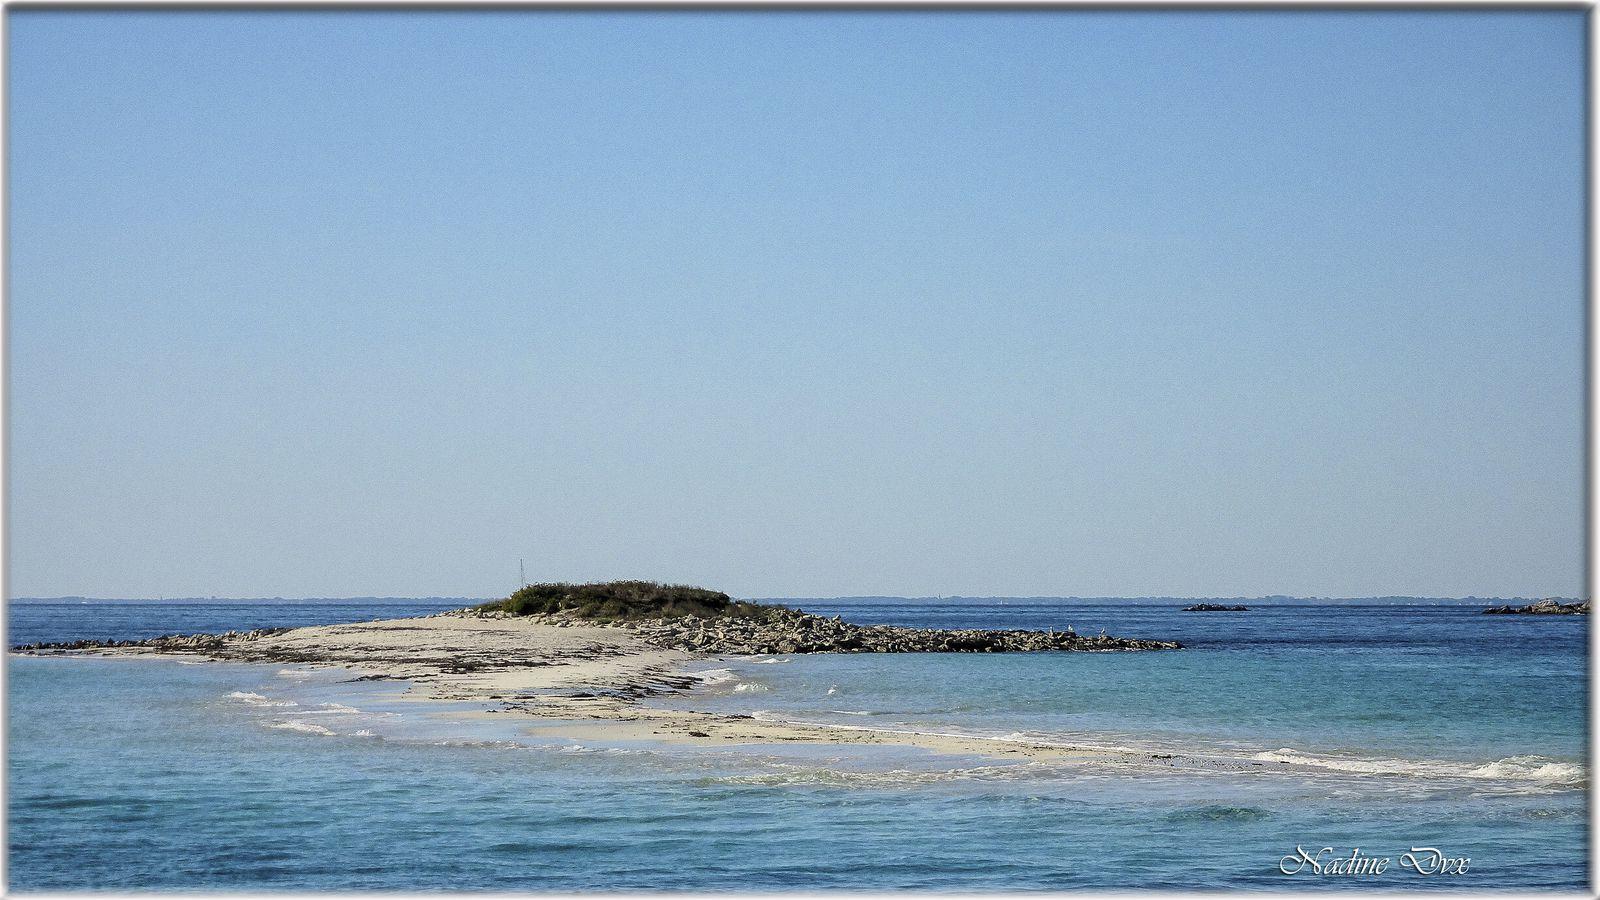 Ile Saint-Nicolas - Archipel des Glénan